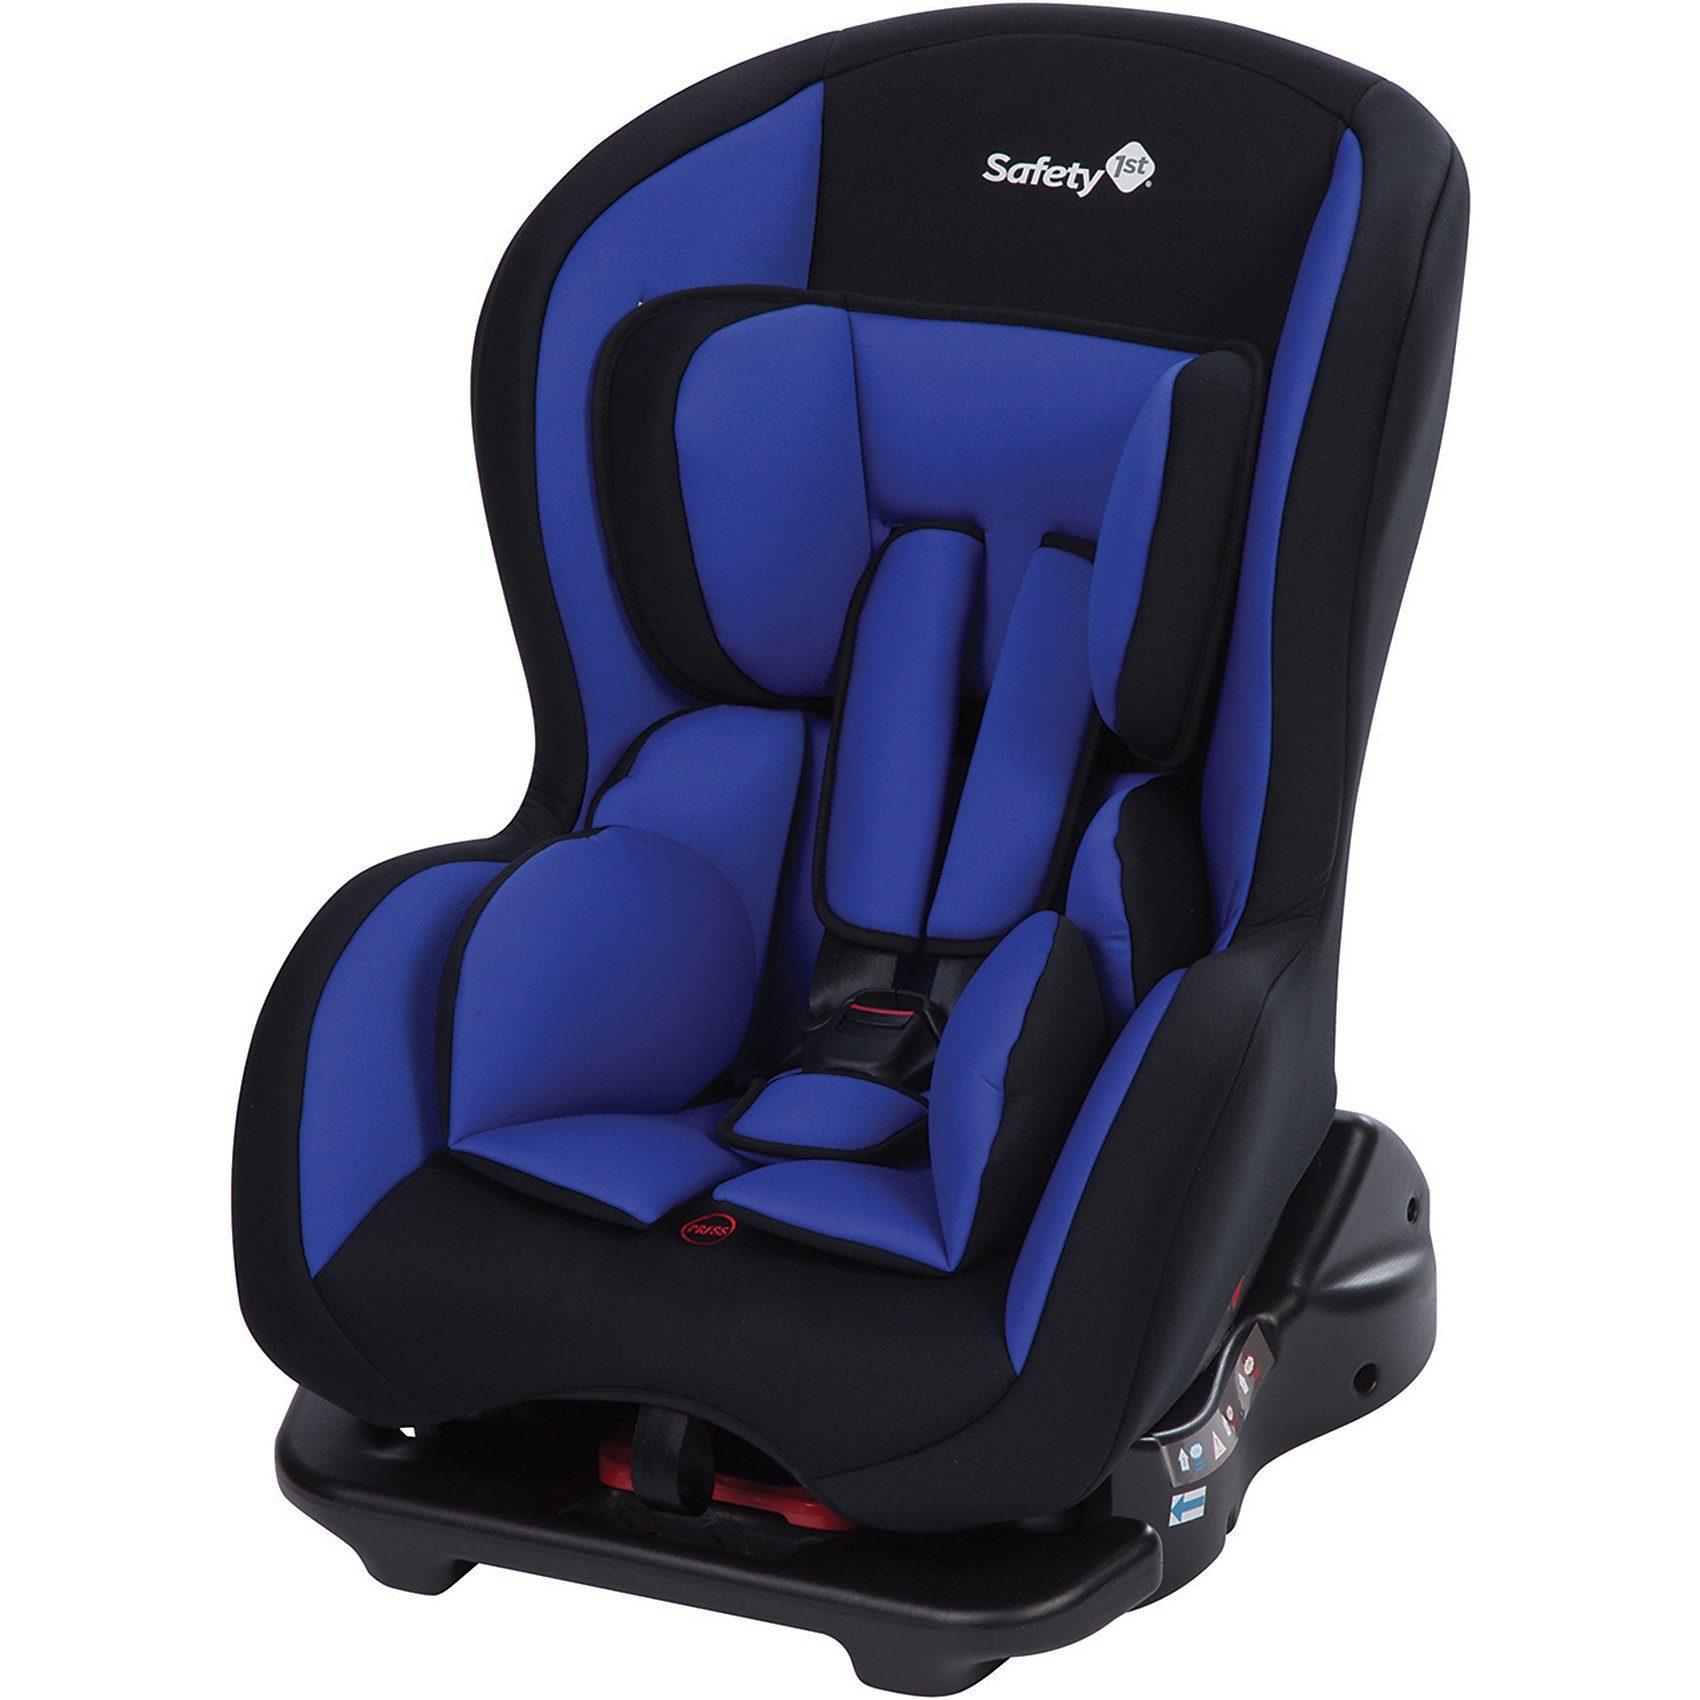 Safety 1st Auto-Kindersitz Sweet Safe, Plain Blue, 2018